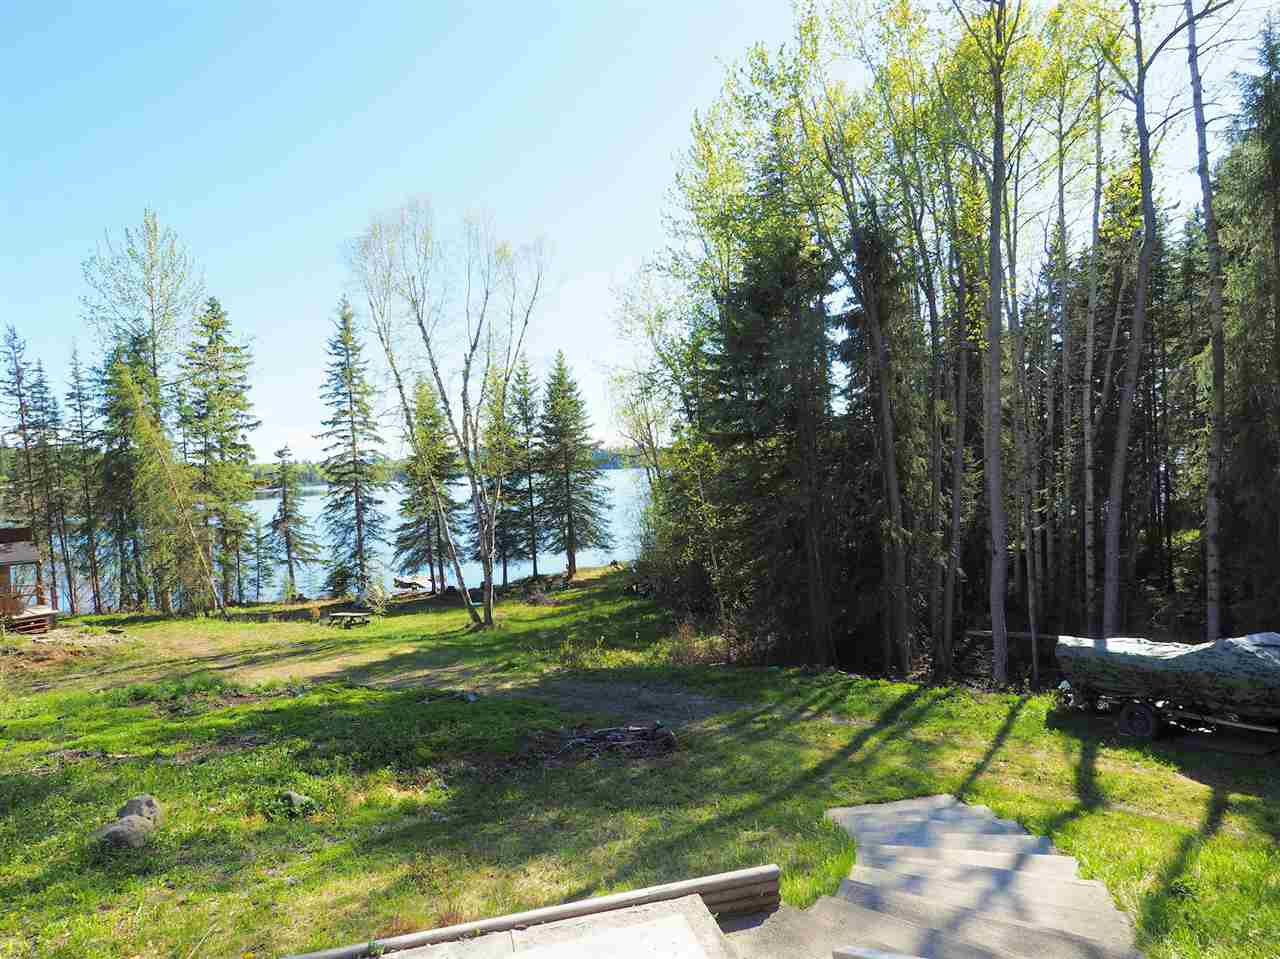 Photo 29: Photos: 8222 CENTENNIAL Road in Bridge Lake: Bridge Lake/Sheridan Lake House for sale (100 Mile House (Zone 10))  : MLS®# R2457362